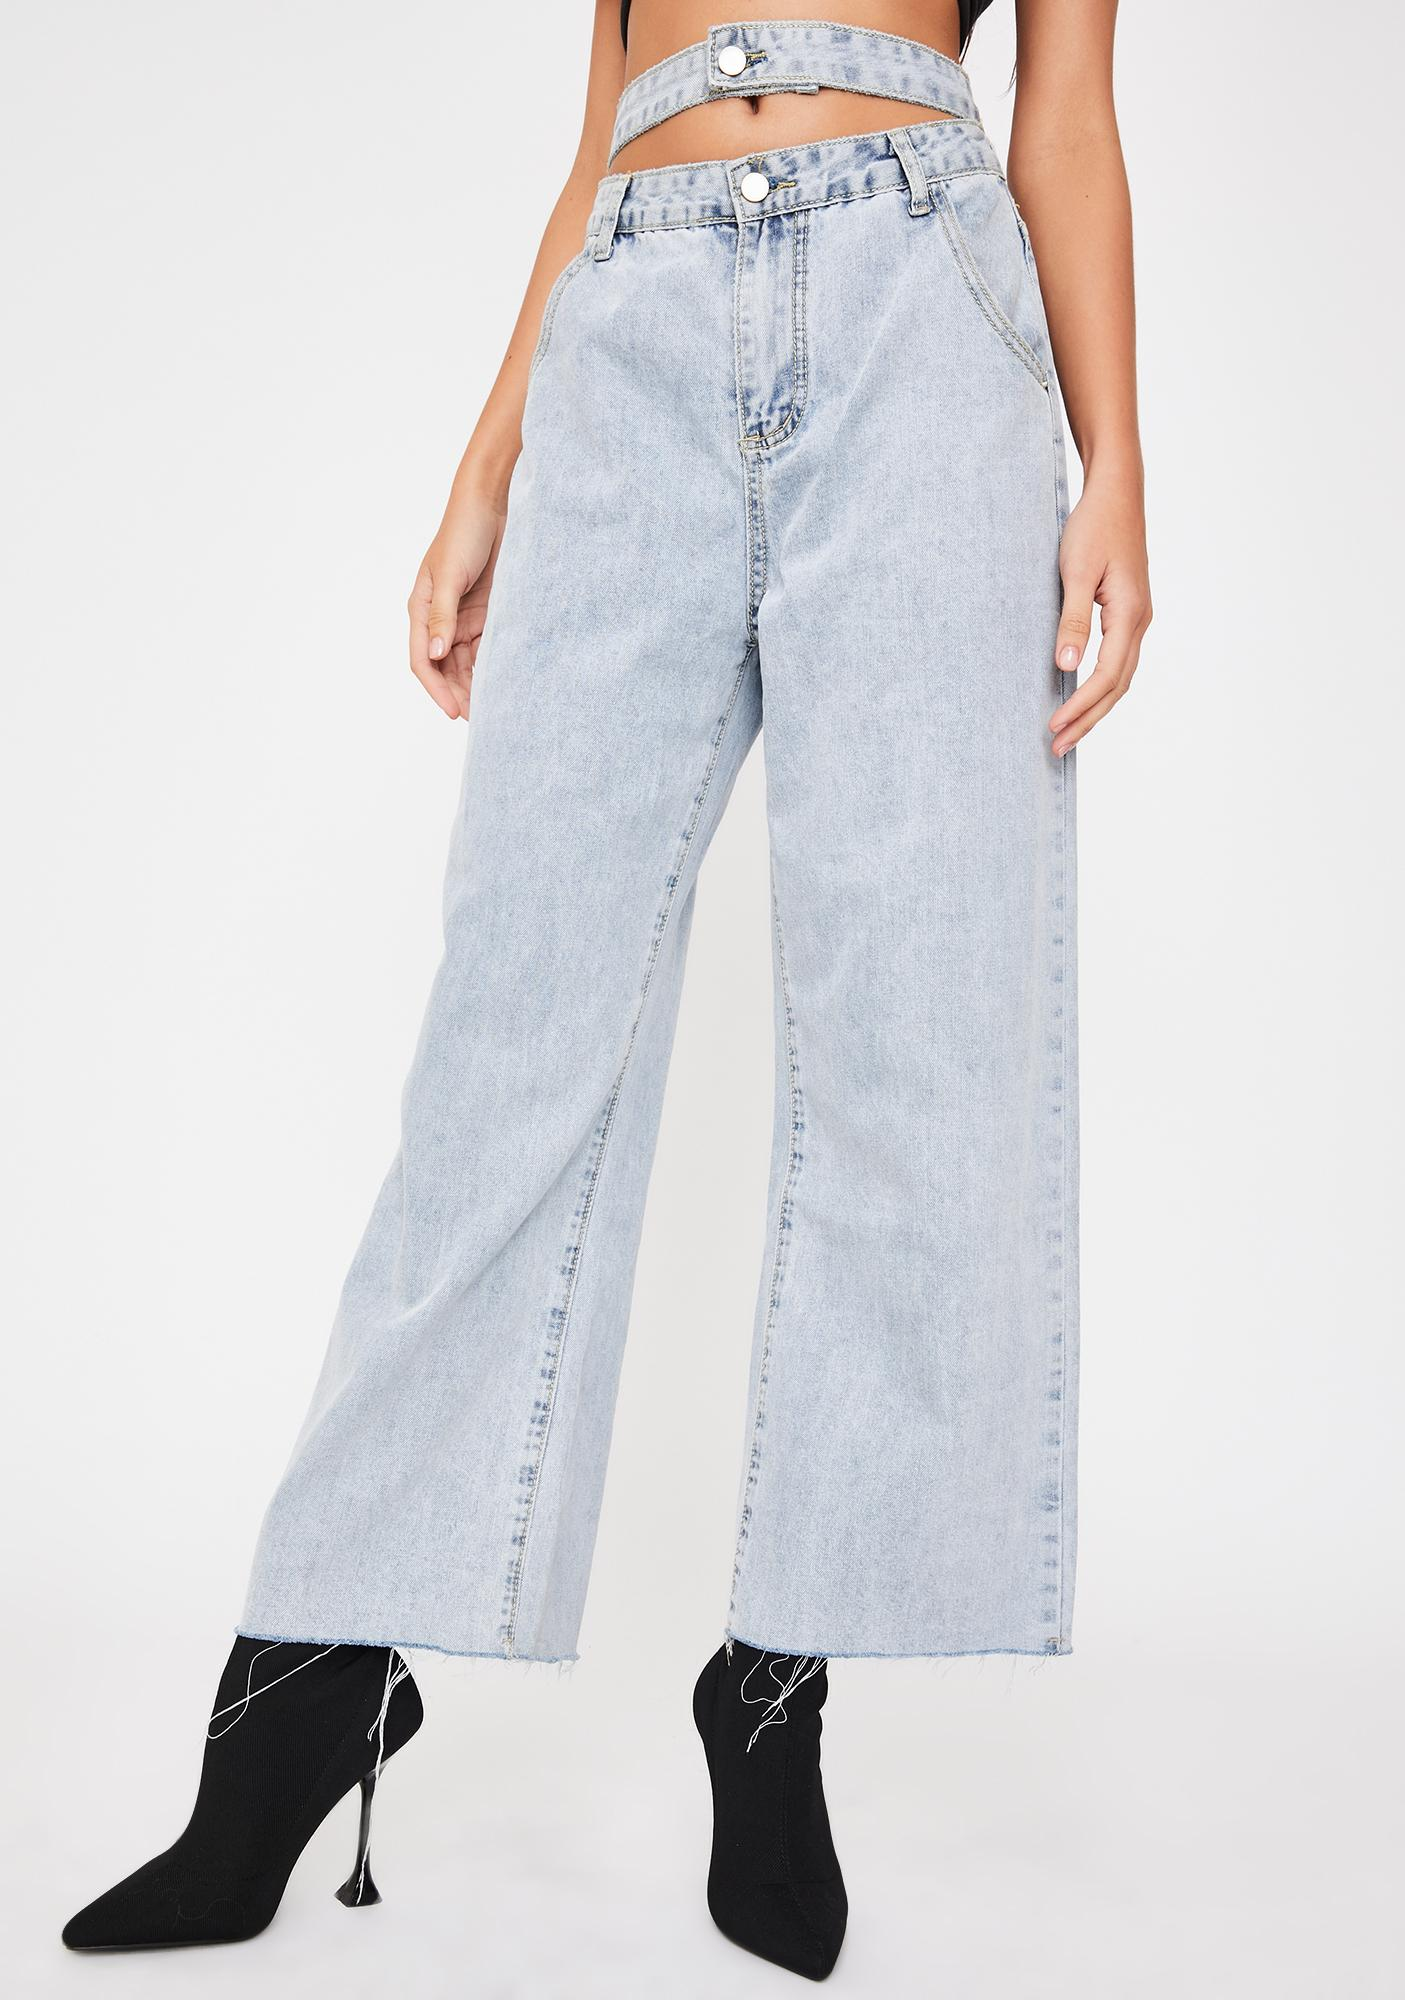 THE KRIPT Juna Wide Leg Jeans